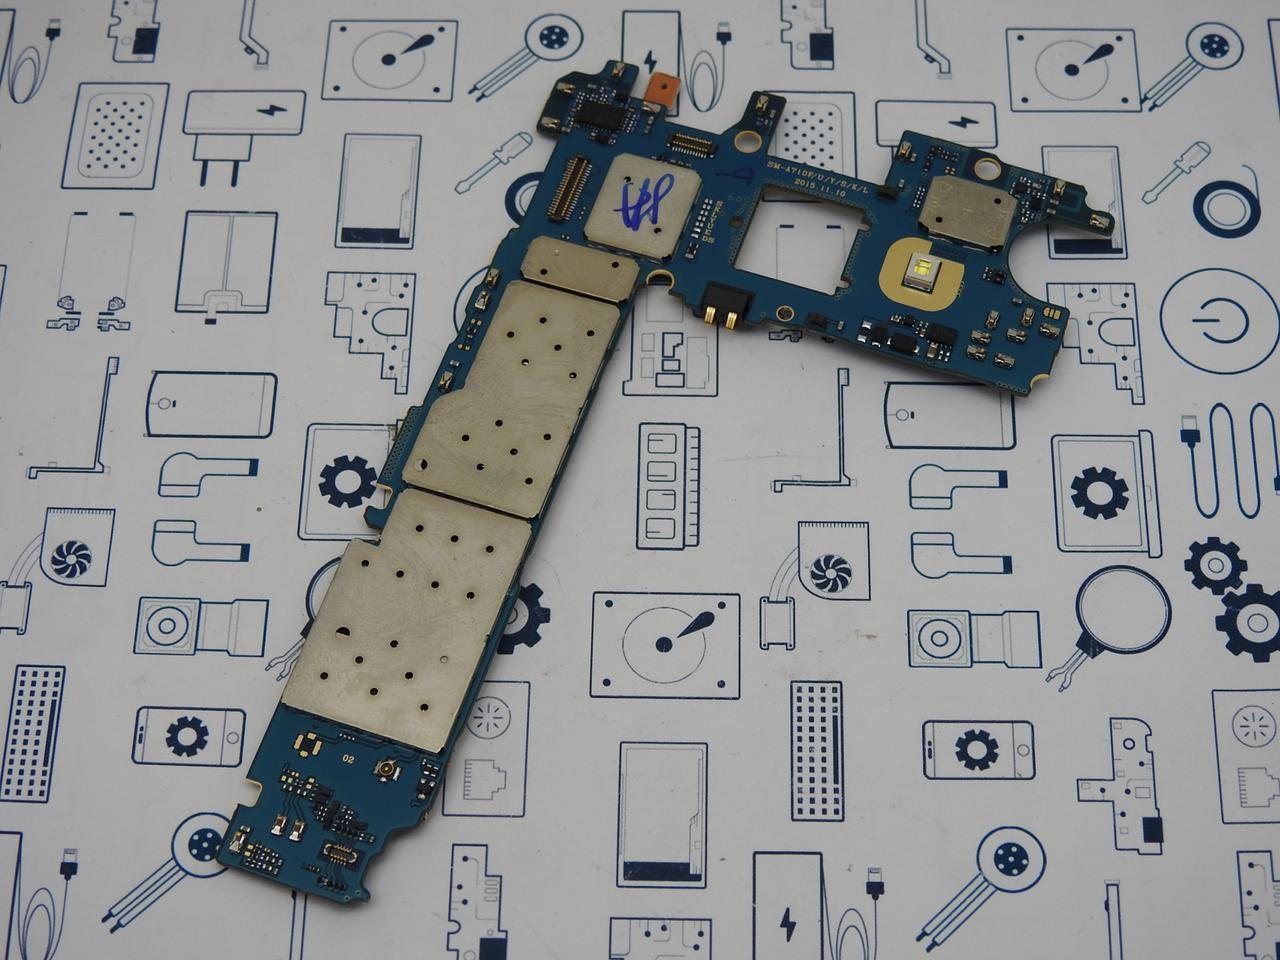 Материнская плата Samsung Galaxy A7 (2016) Duos SM-A710F 3\16GB UACRF оригинал с разборки (100% рабочая)